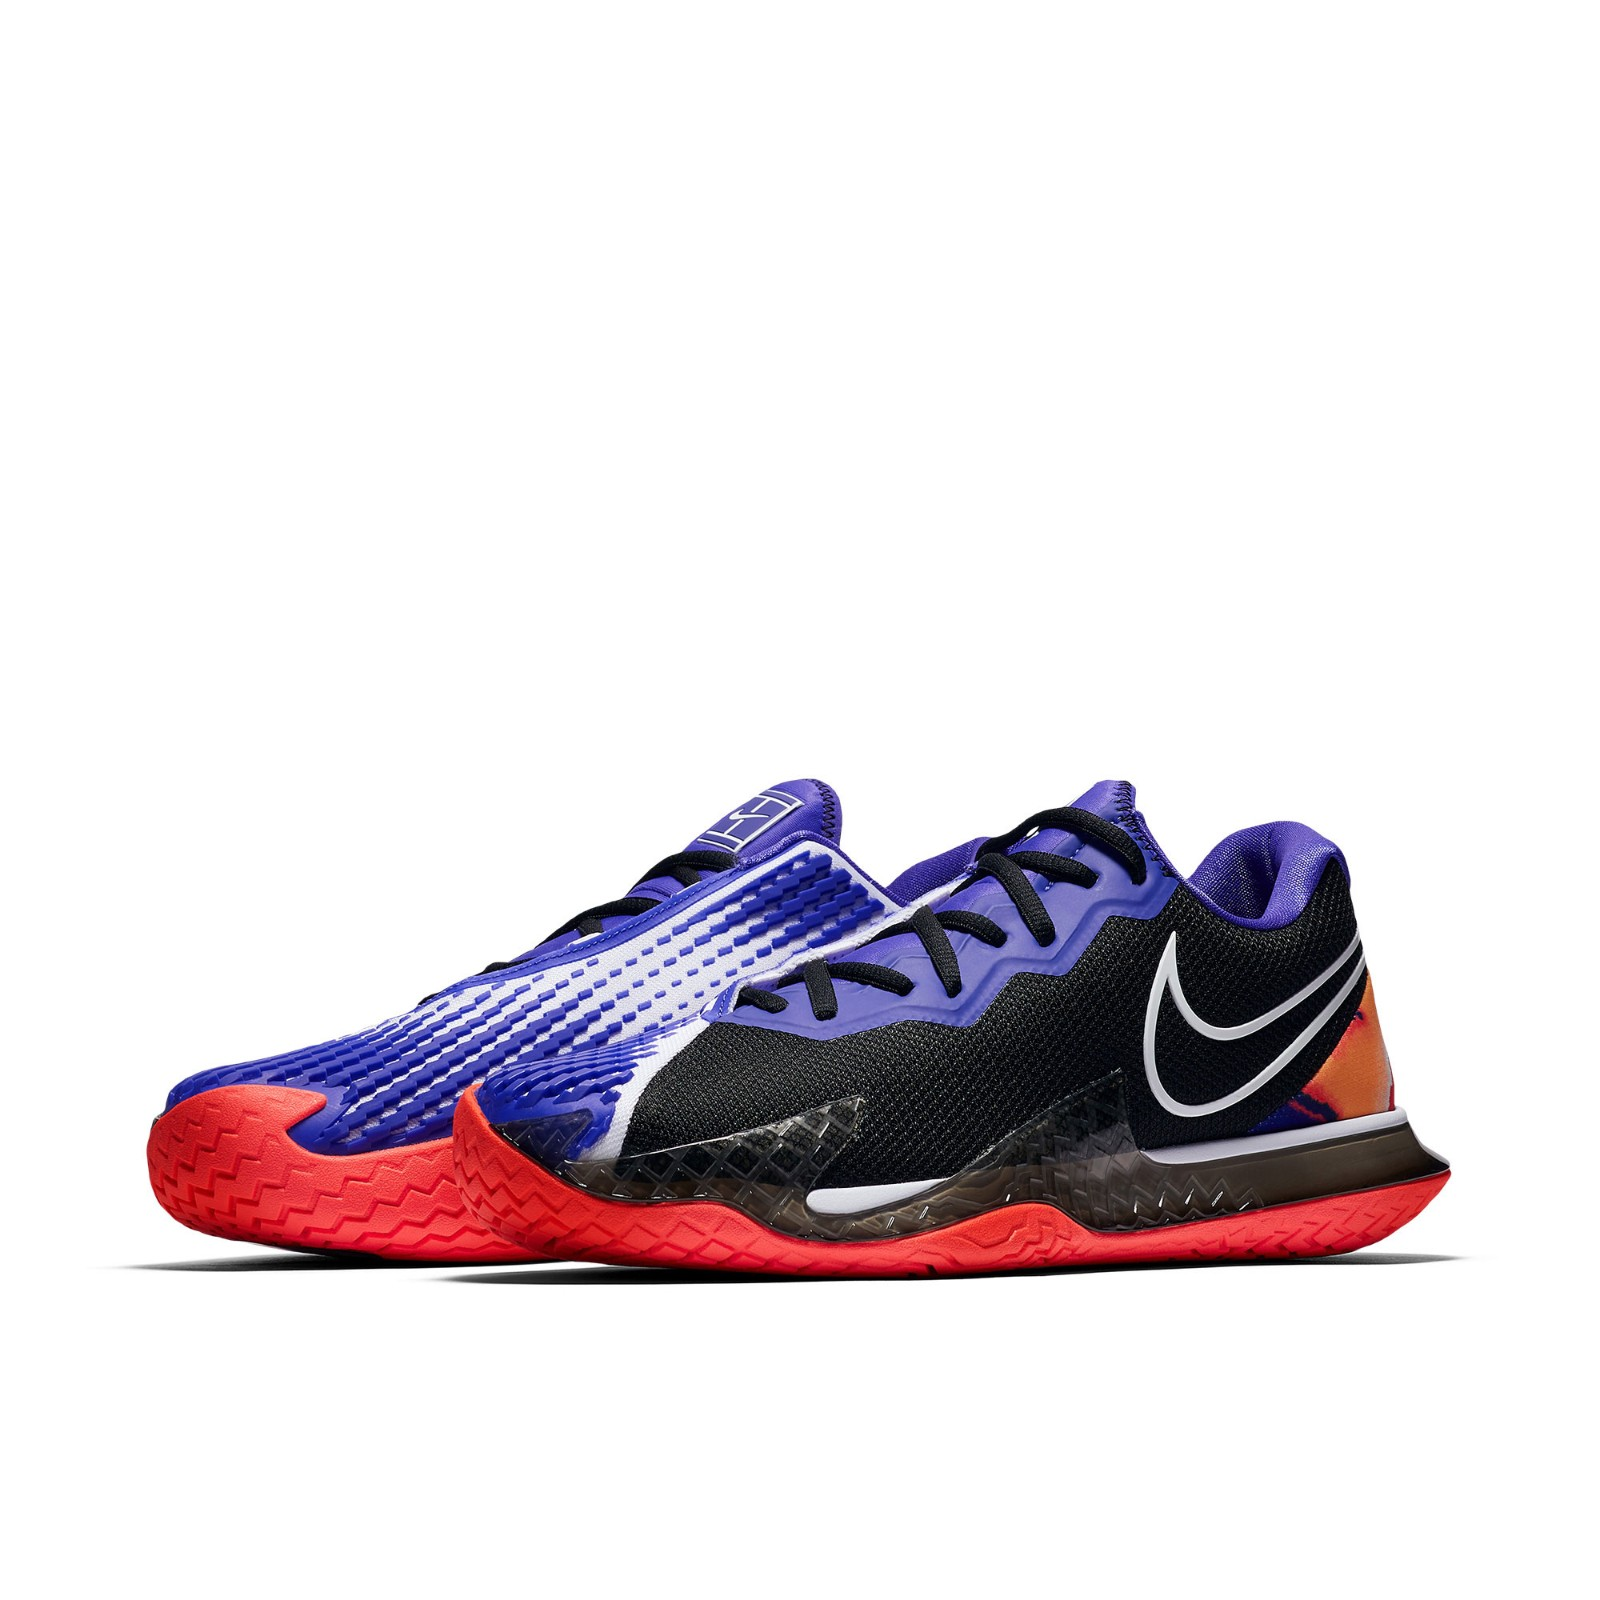 NIKE 耐克 AIR ZOOM VAPOR CAGE 4 HC CD0424 男子网球鞋